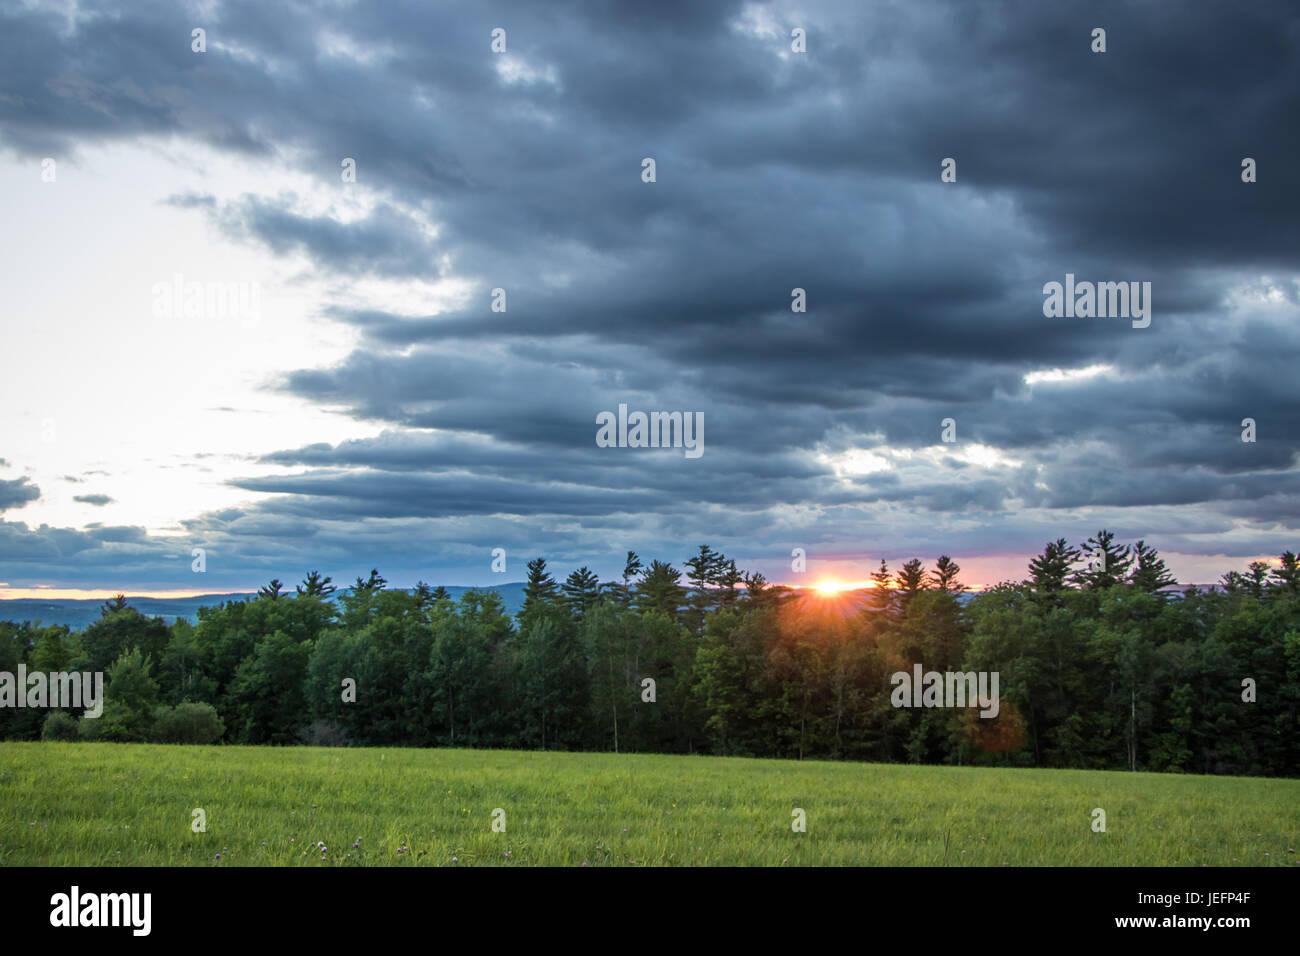 Dramatic Sunset Over Pine Trees Stock Photo